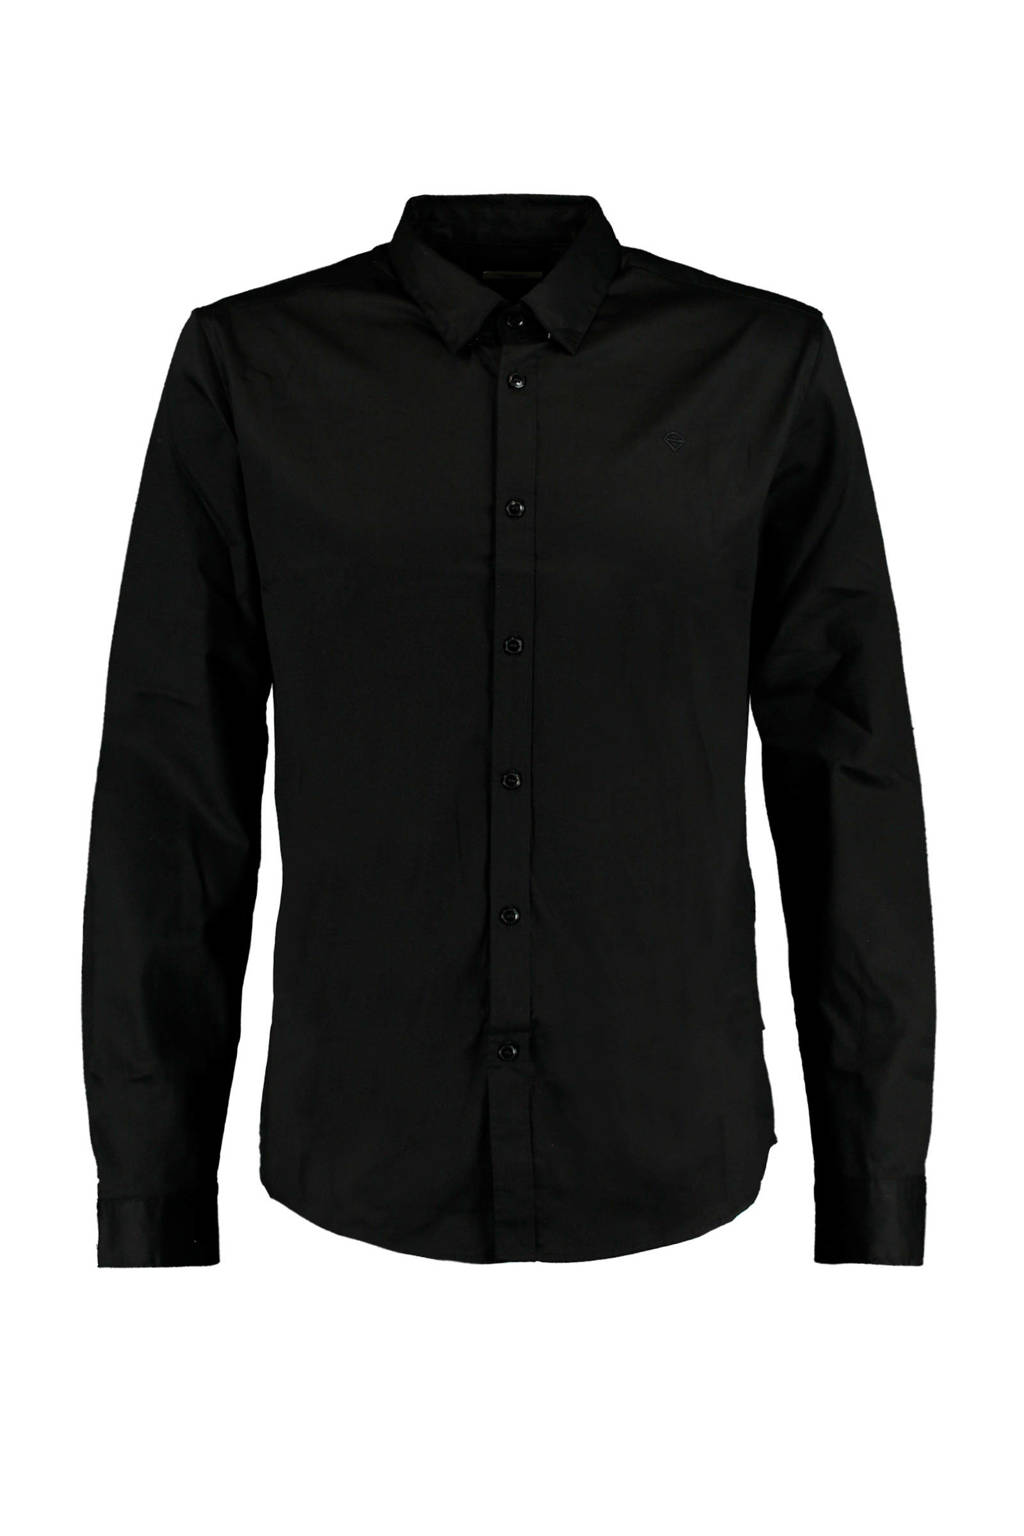 America Today regular fit overhemd Hack zwart, Zwart